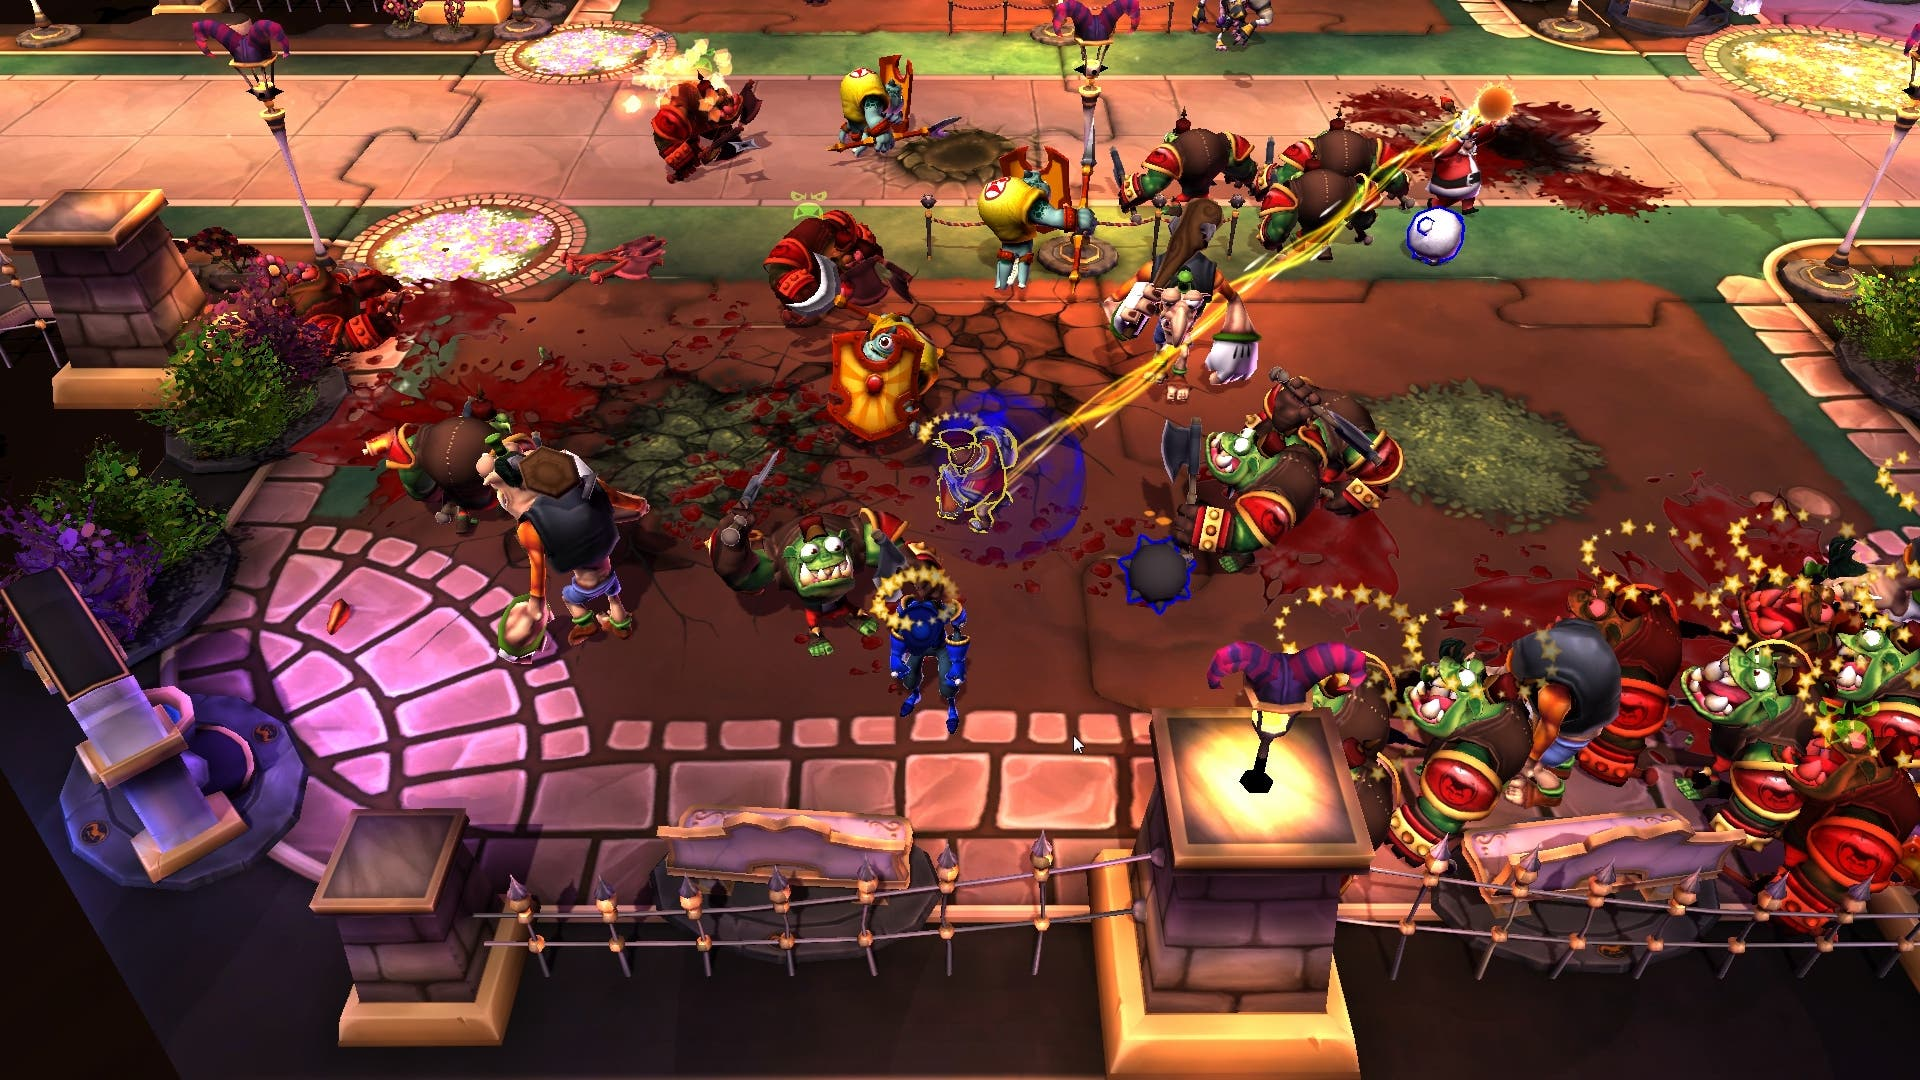 Dungeonland matchmaking server